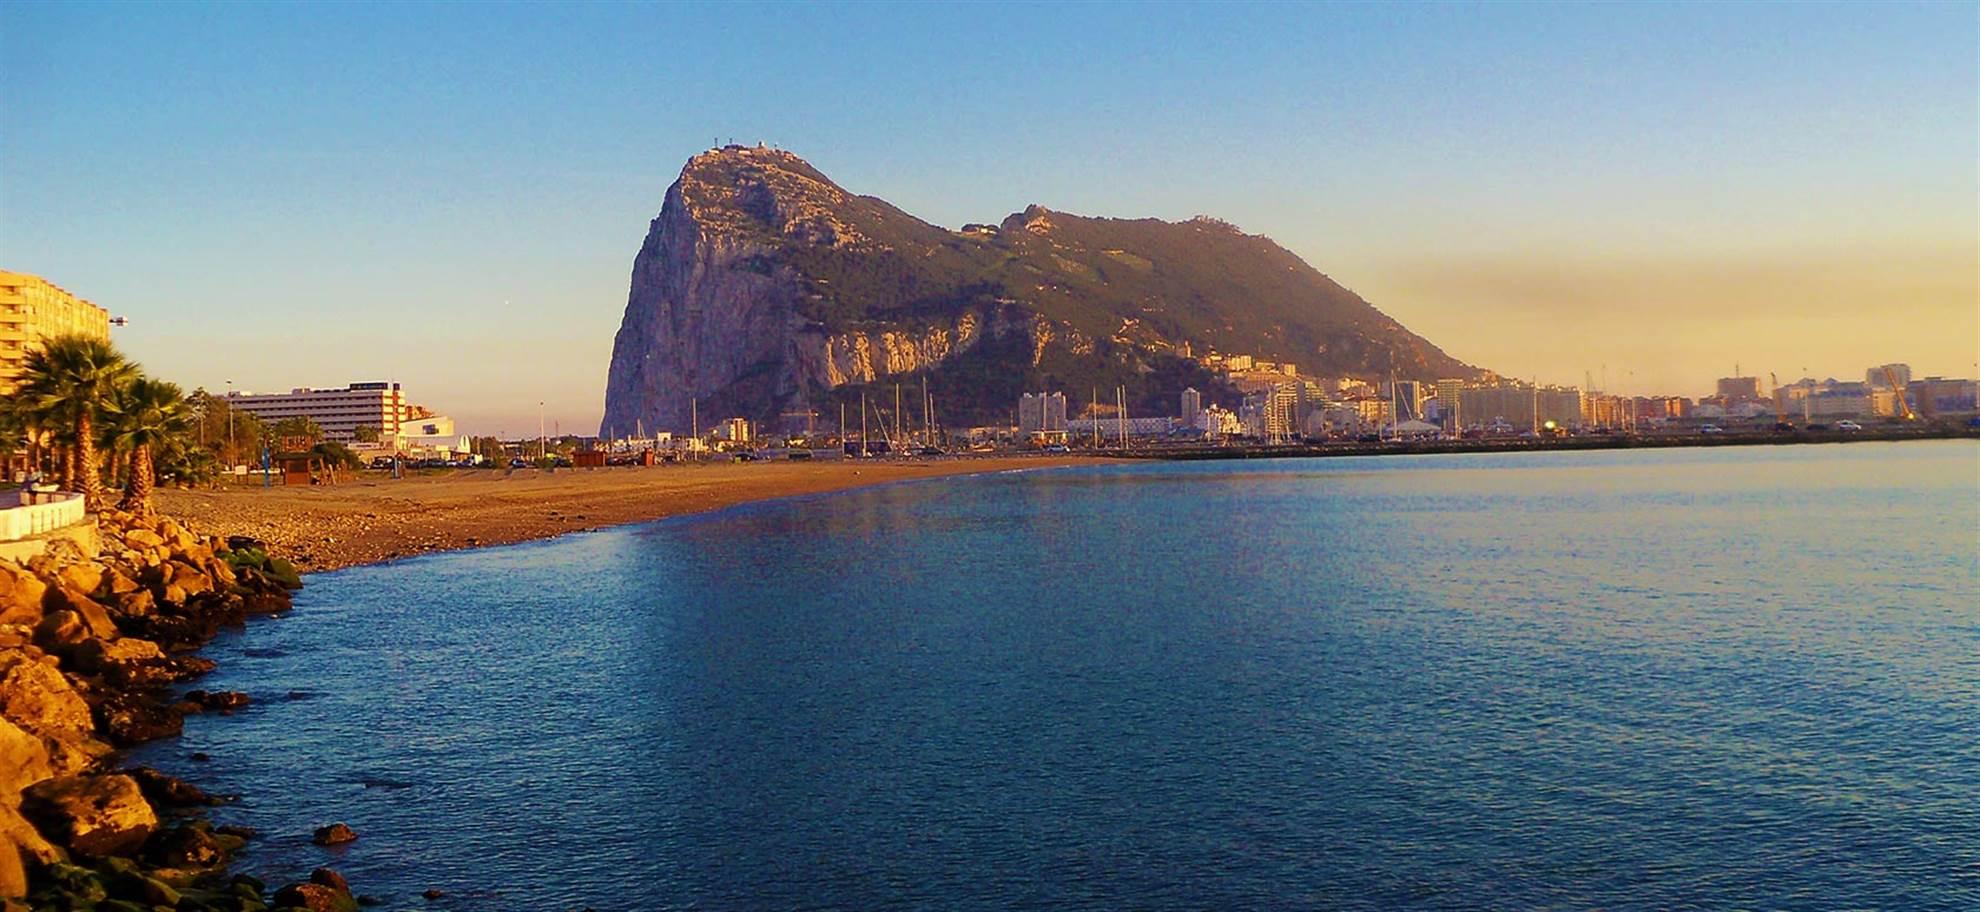 Gibraltar, bezienswaardigheden tour & winkelen(SVQGIBRL)